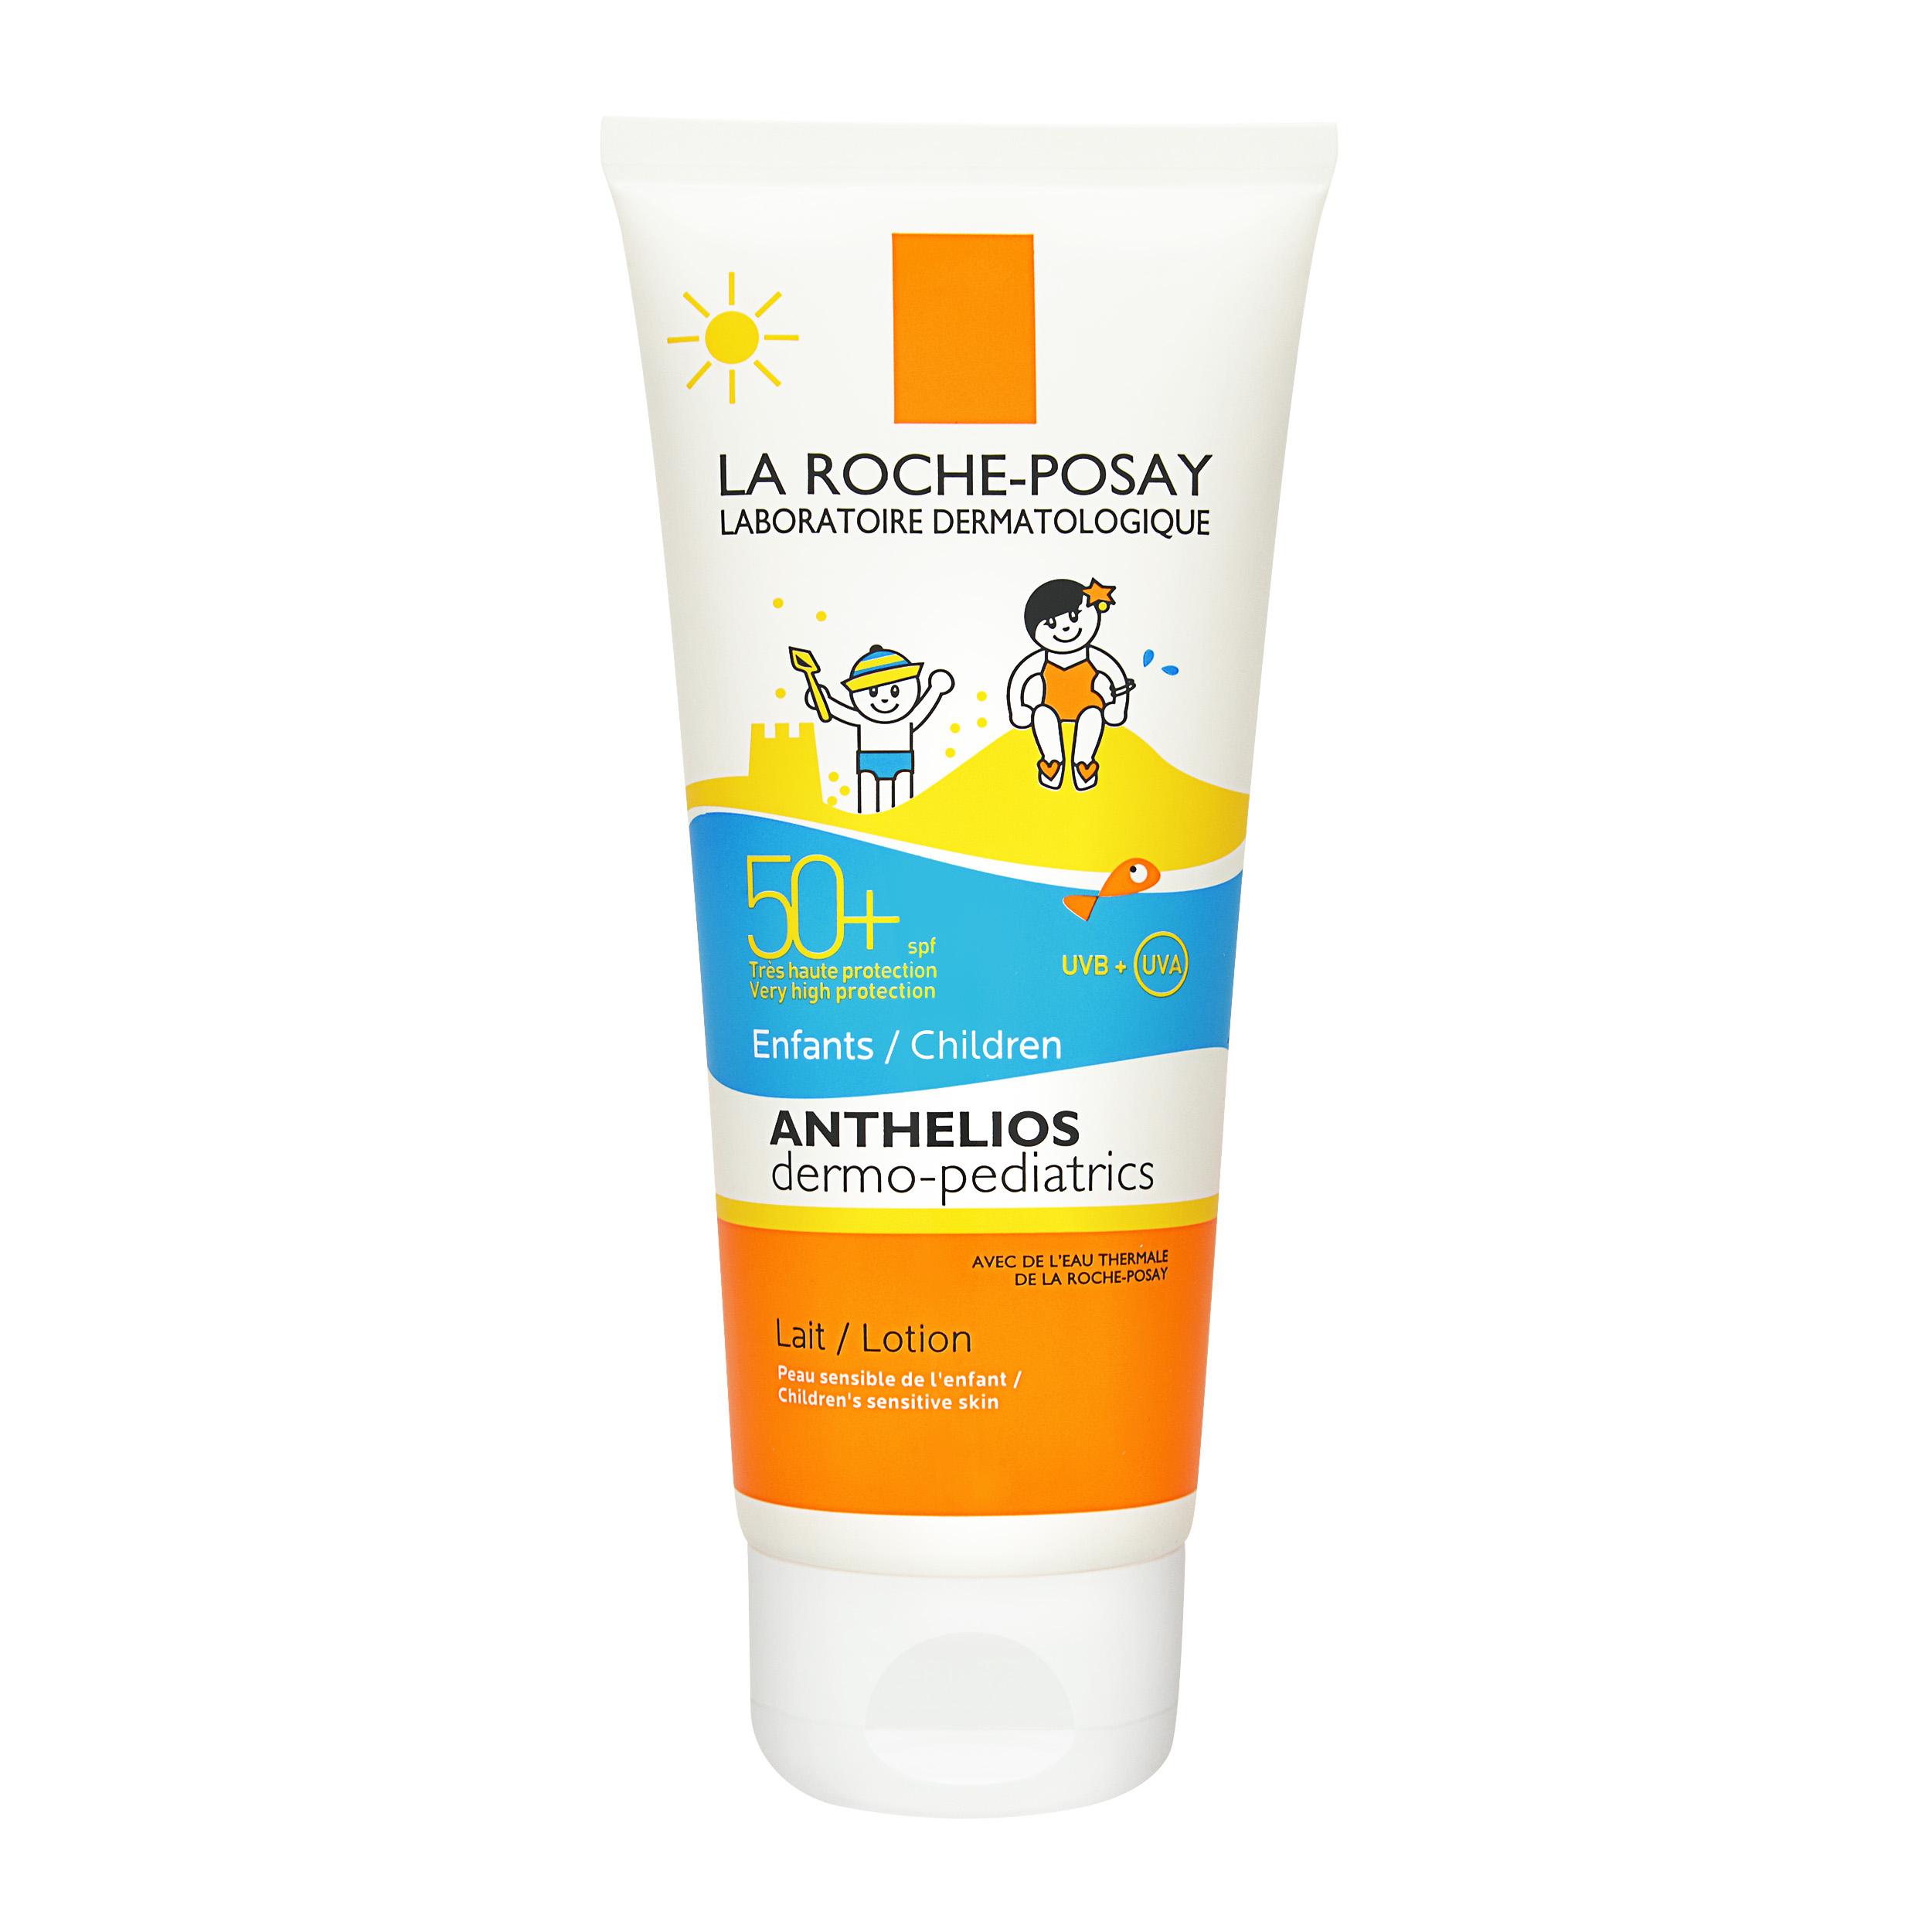 La Roche-Posay Anthelios Dermo-Pediatrics  Velvety Lotion SPF 50+  100ml, from Cosme-De.com